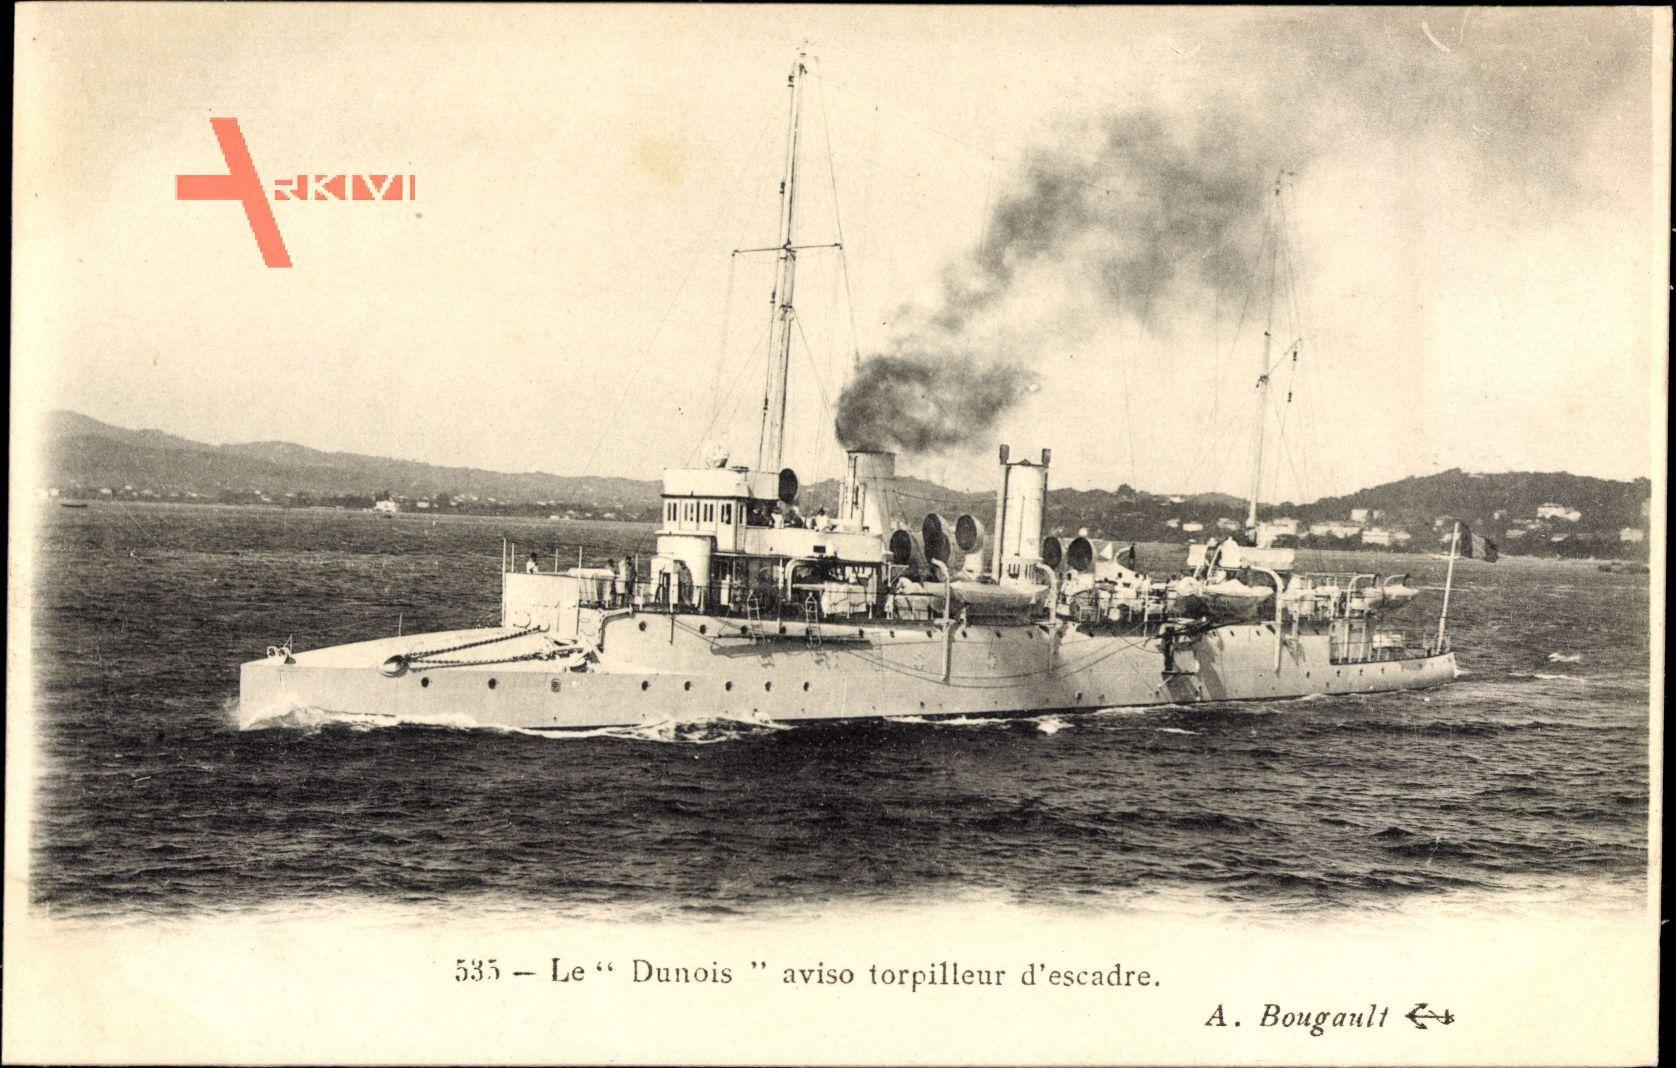 Französisches Kriegsschiff, Le Dunois, Aviso Torpilleur dEscadre